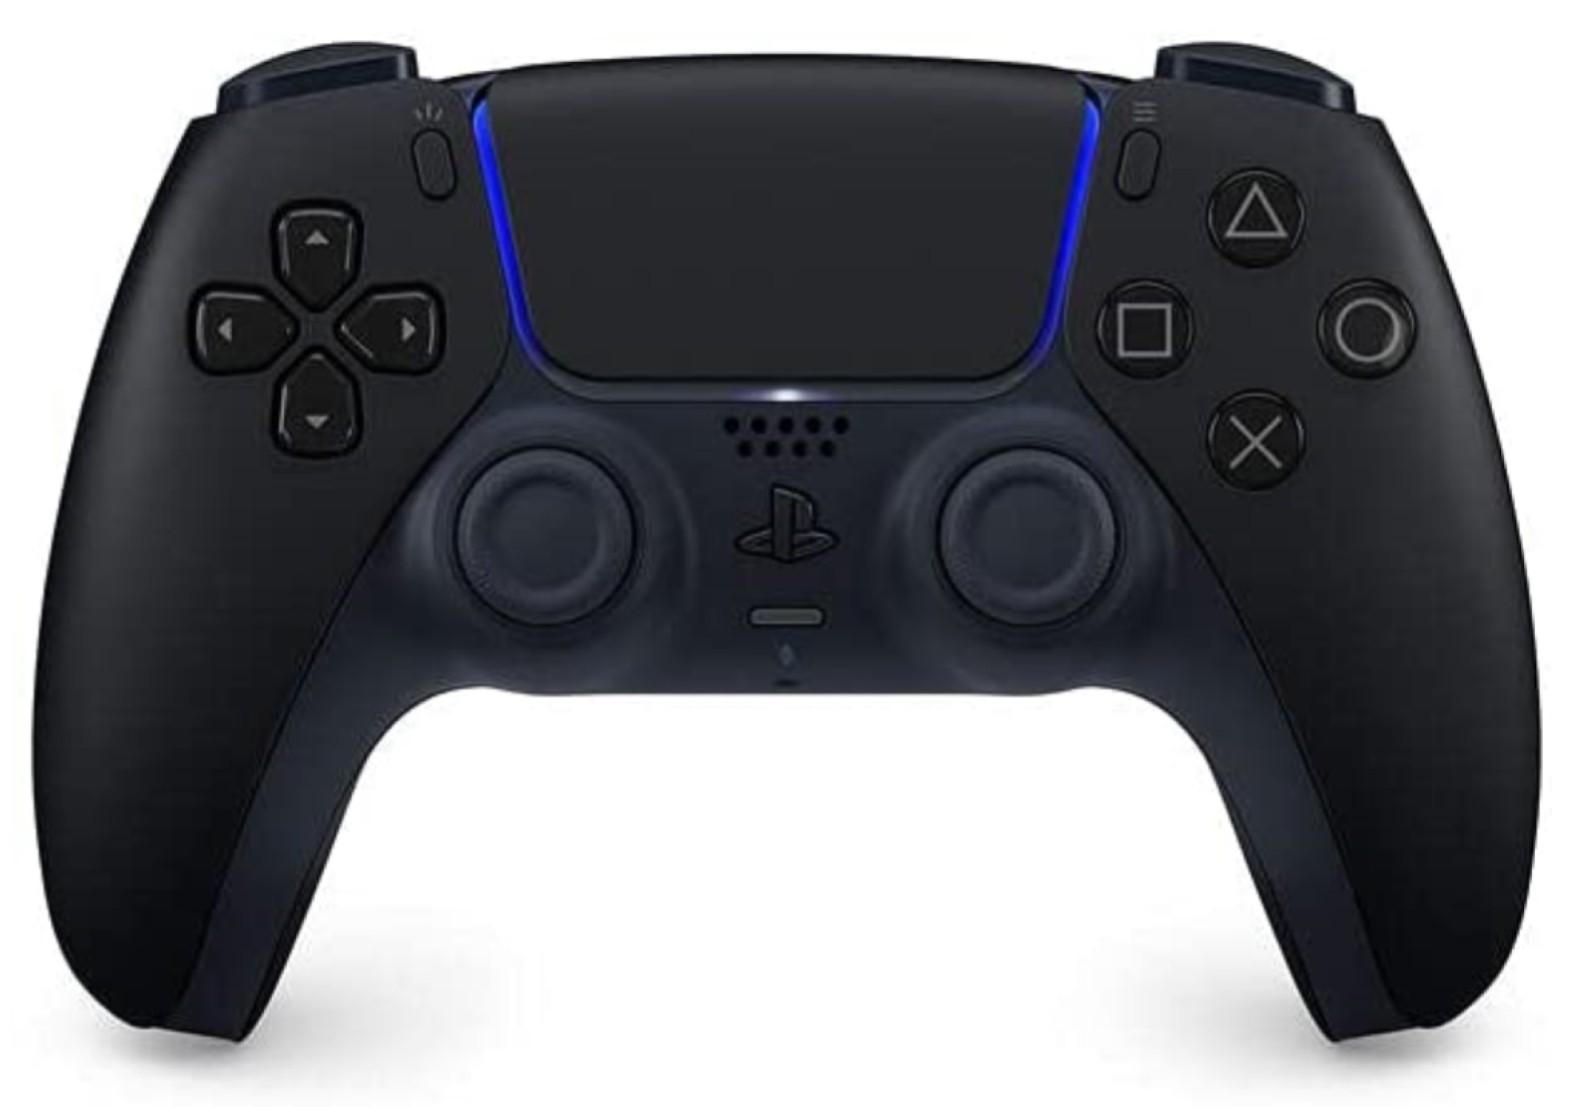 Бездротовий контролер/джойстик/геймпад DualSense для PlayStation 5 | DualSense Midnight Black Wireless Controller PS5